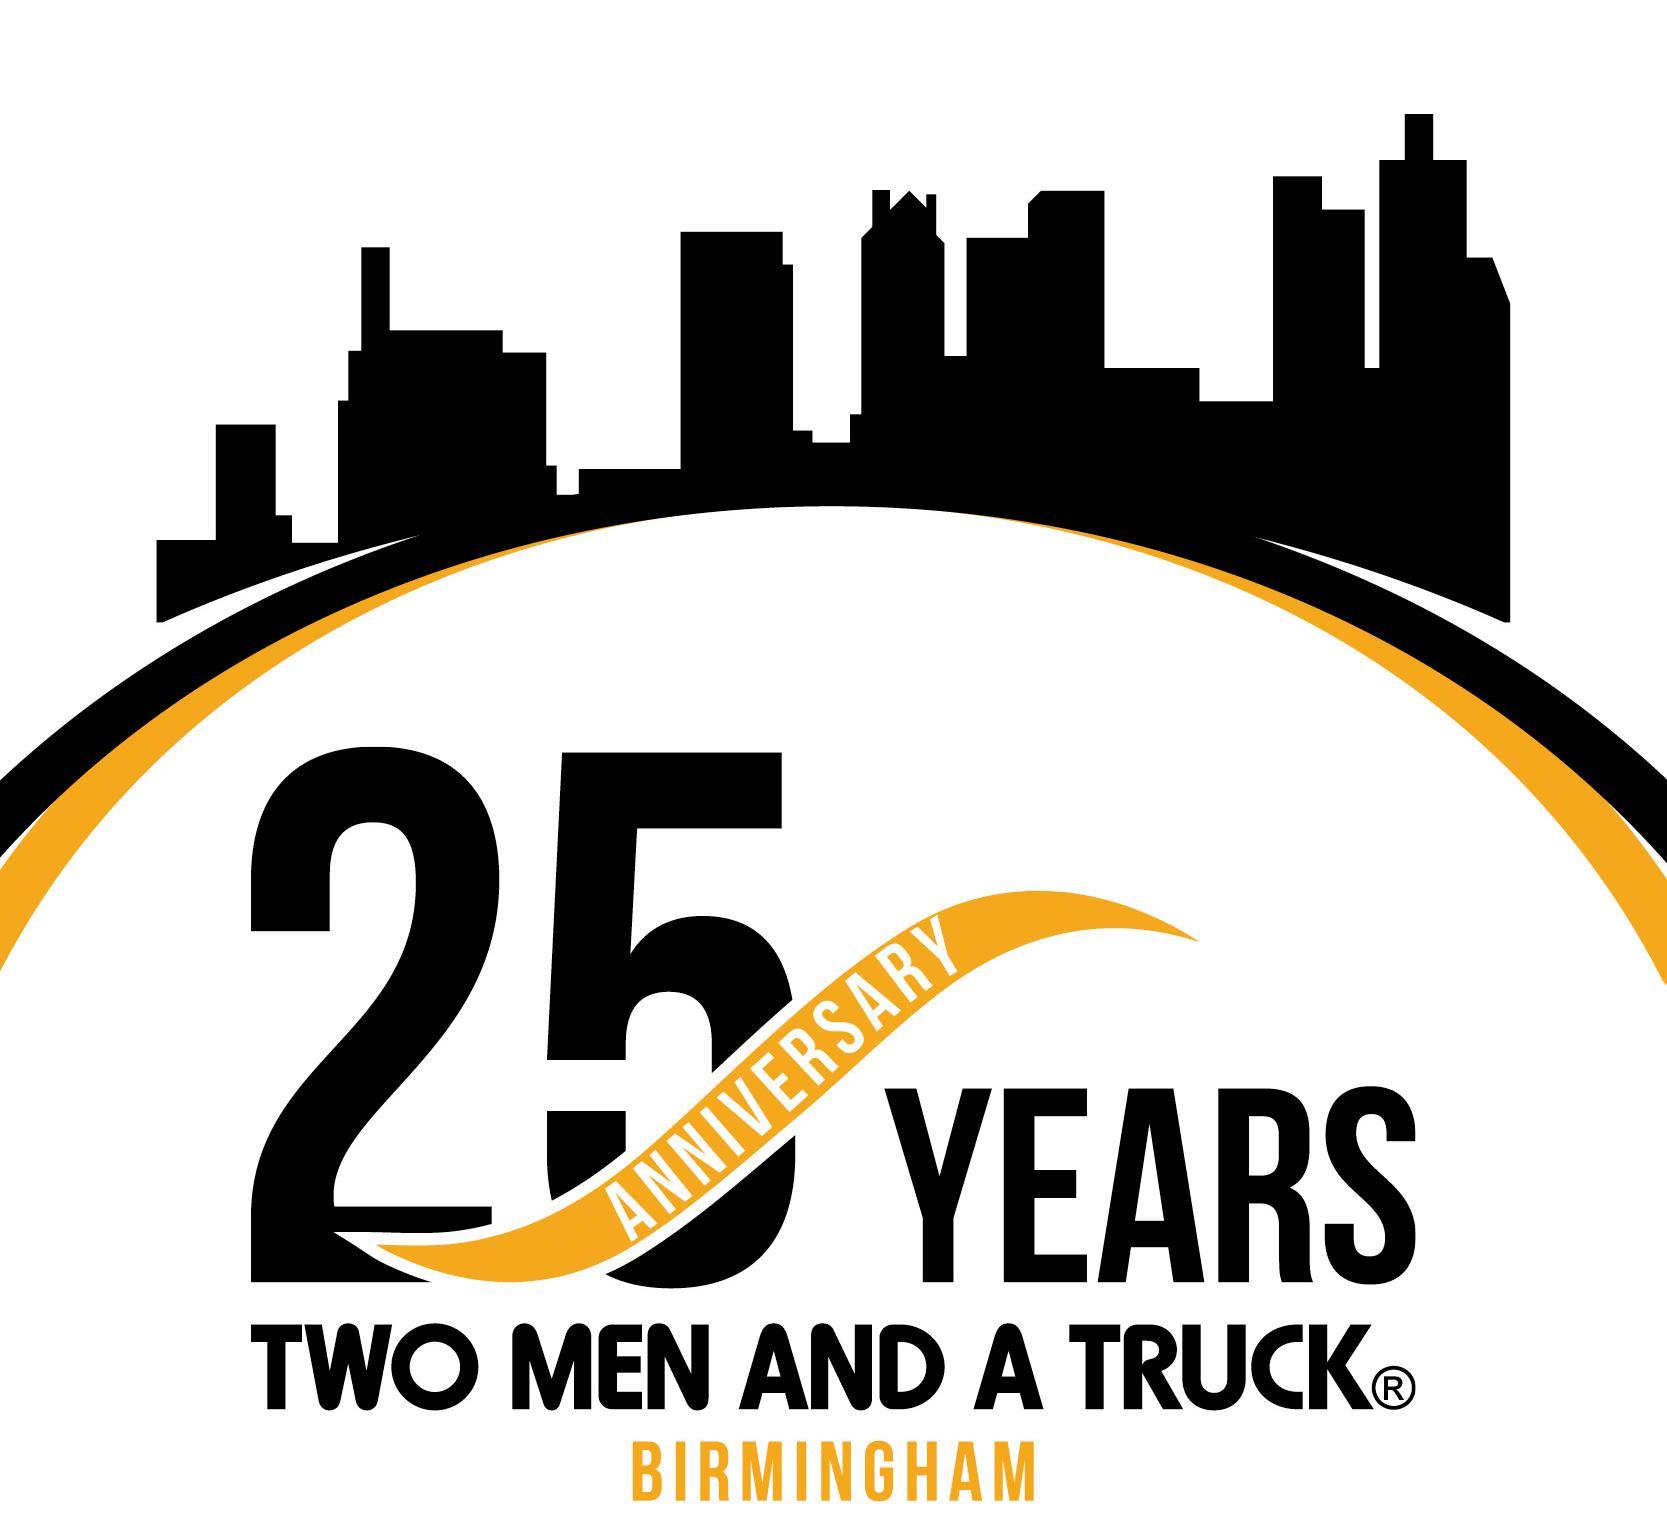 celebrating 25 years of moving in Birmingham Alabama